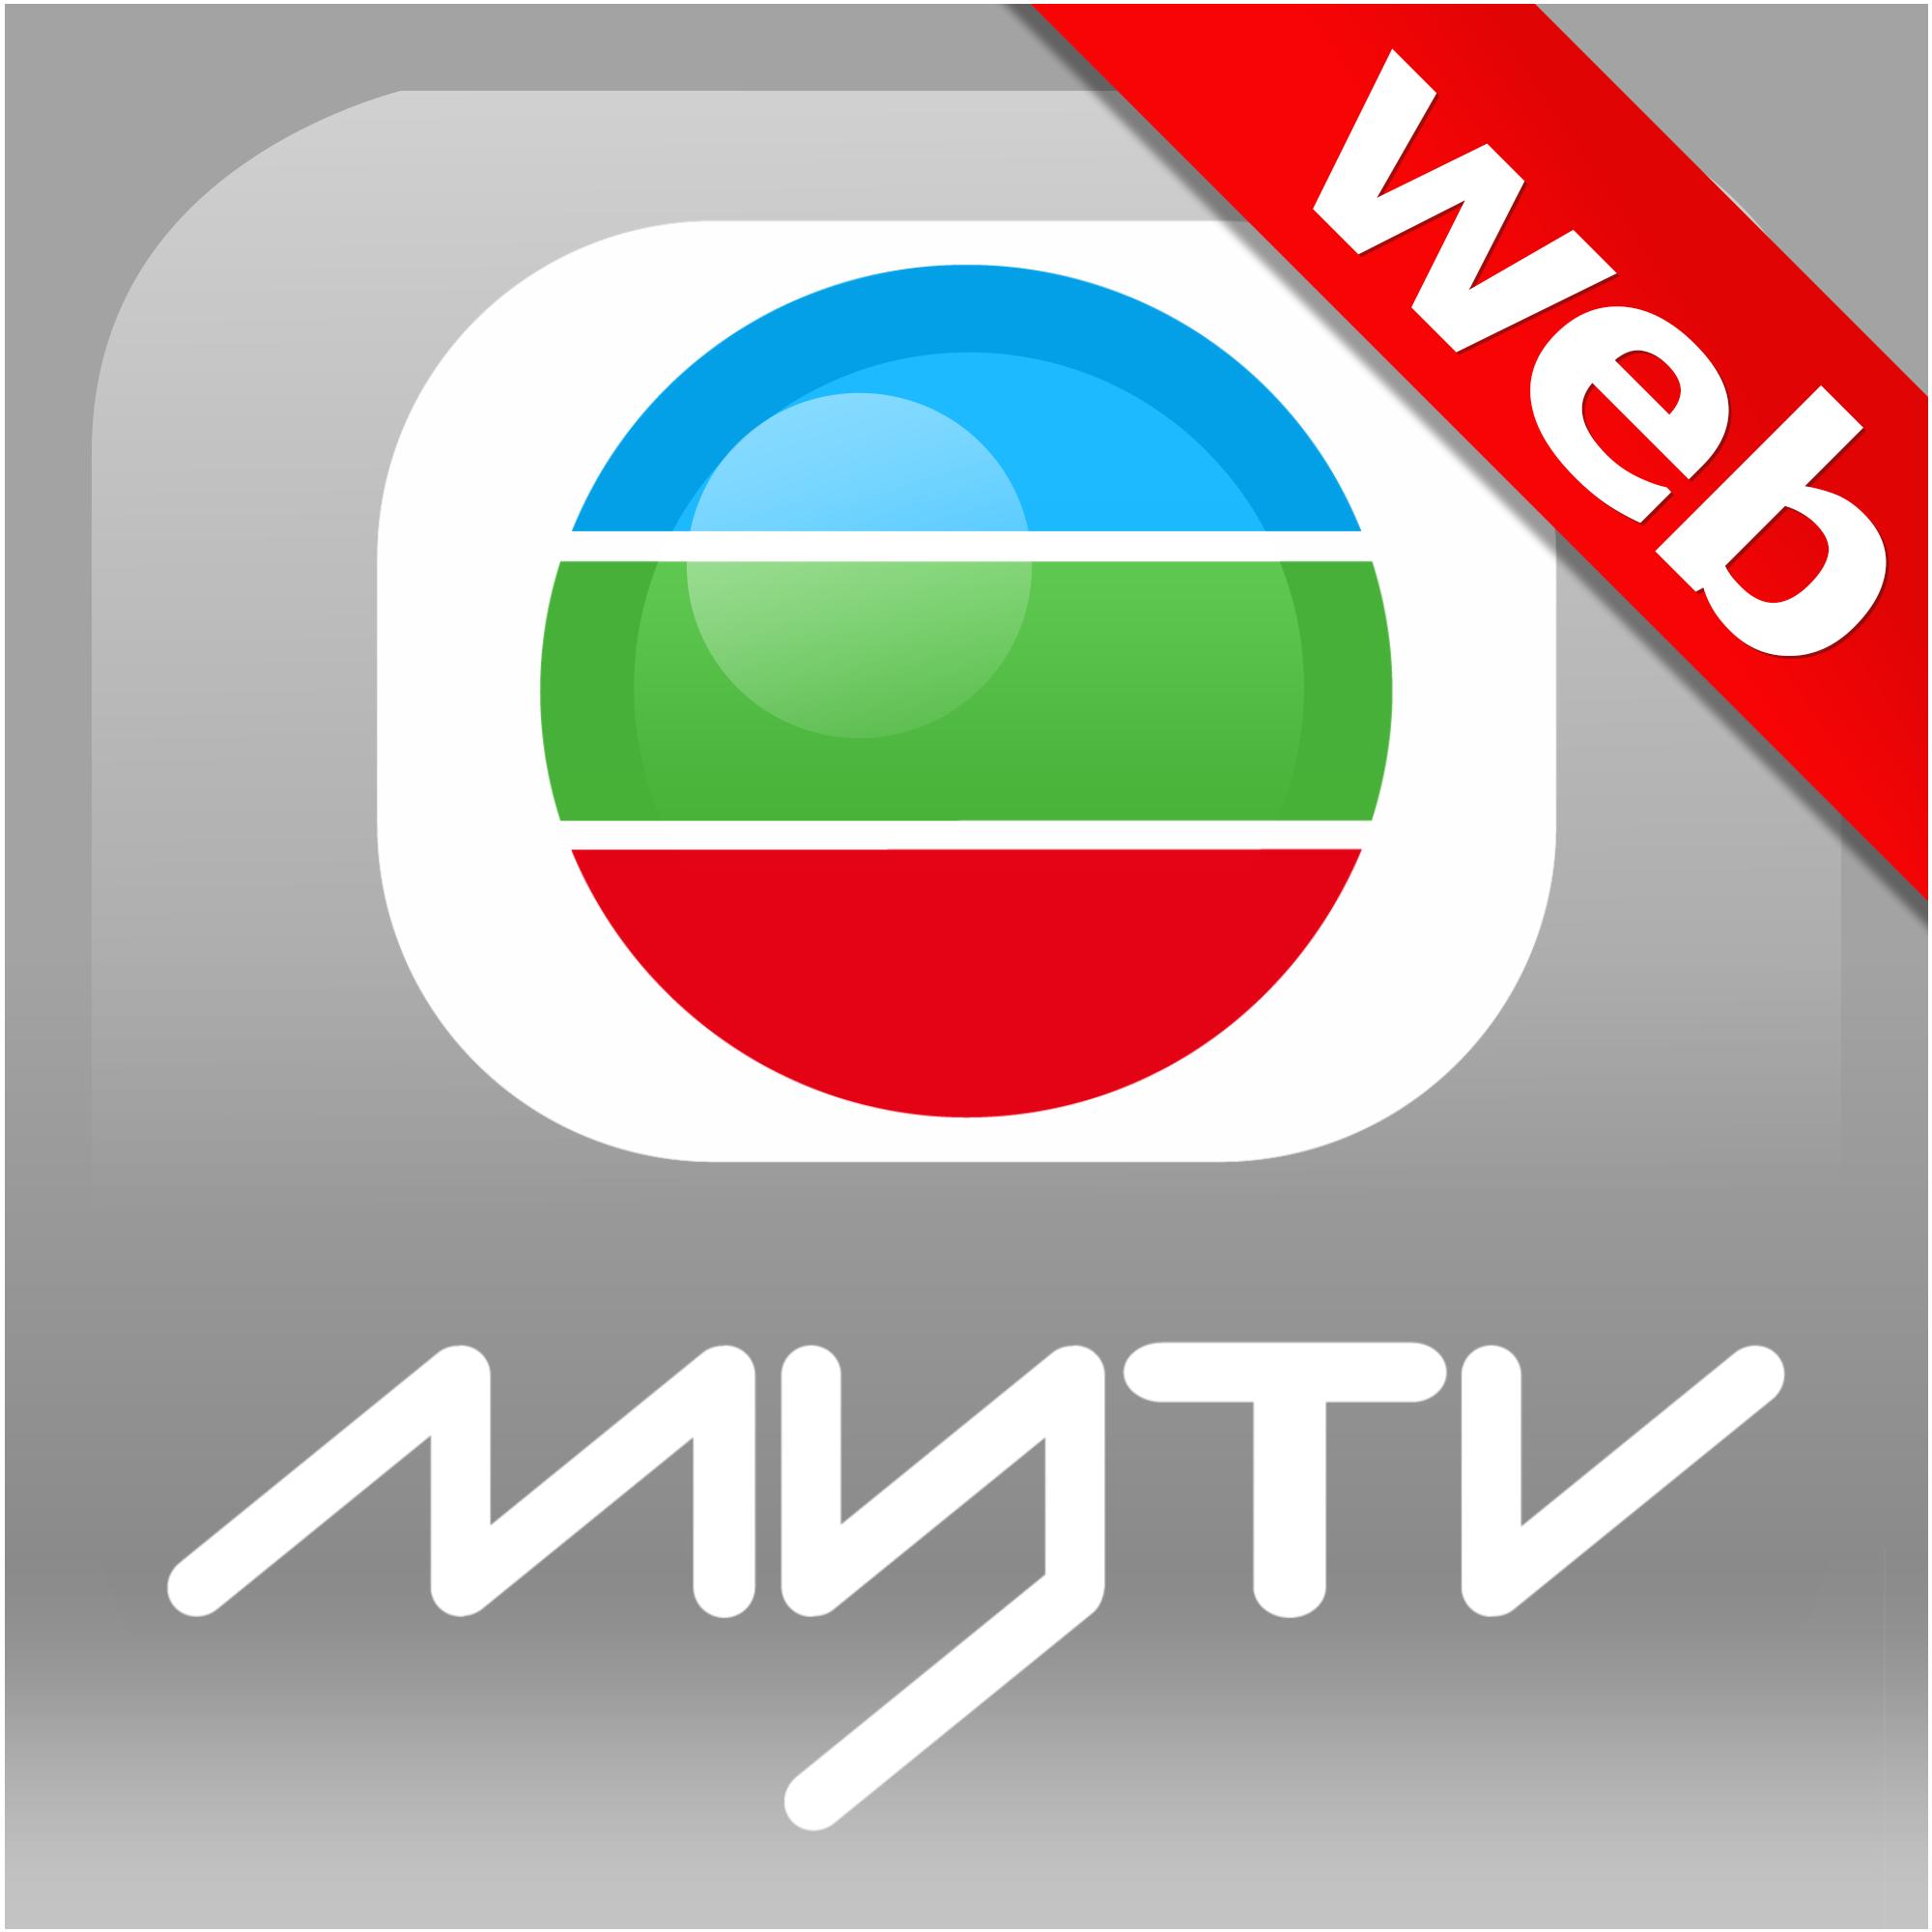 myTV - 直播- J2 - tvb.com